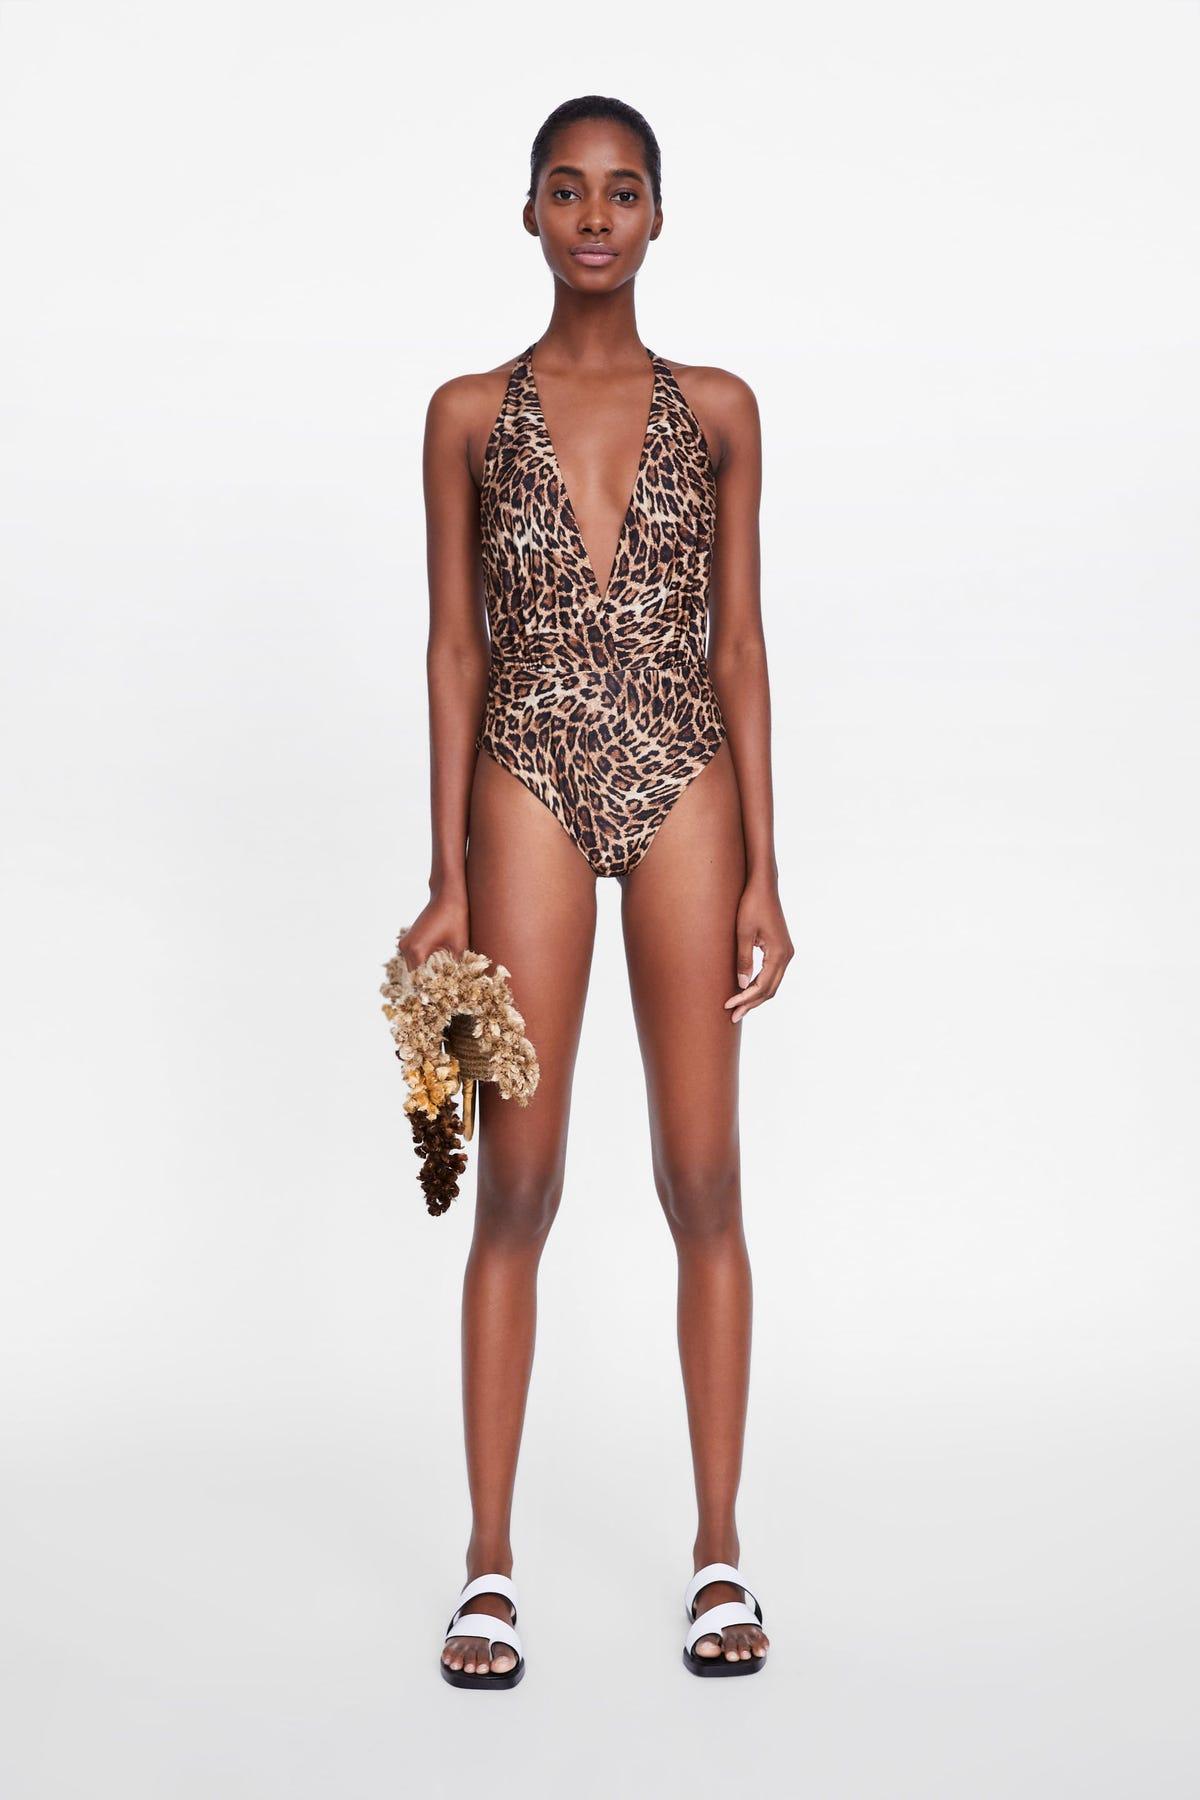 2019 Zara Summer Beachwear Swimamp; Spring Collection lFK5JTu13c